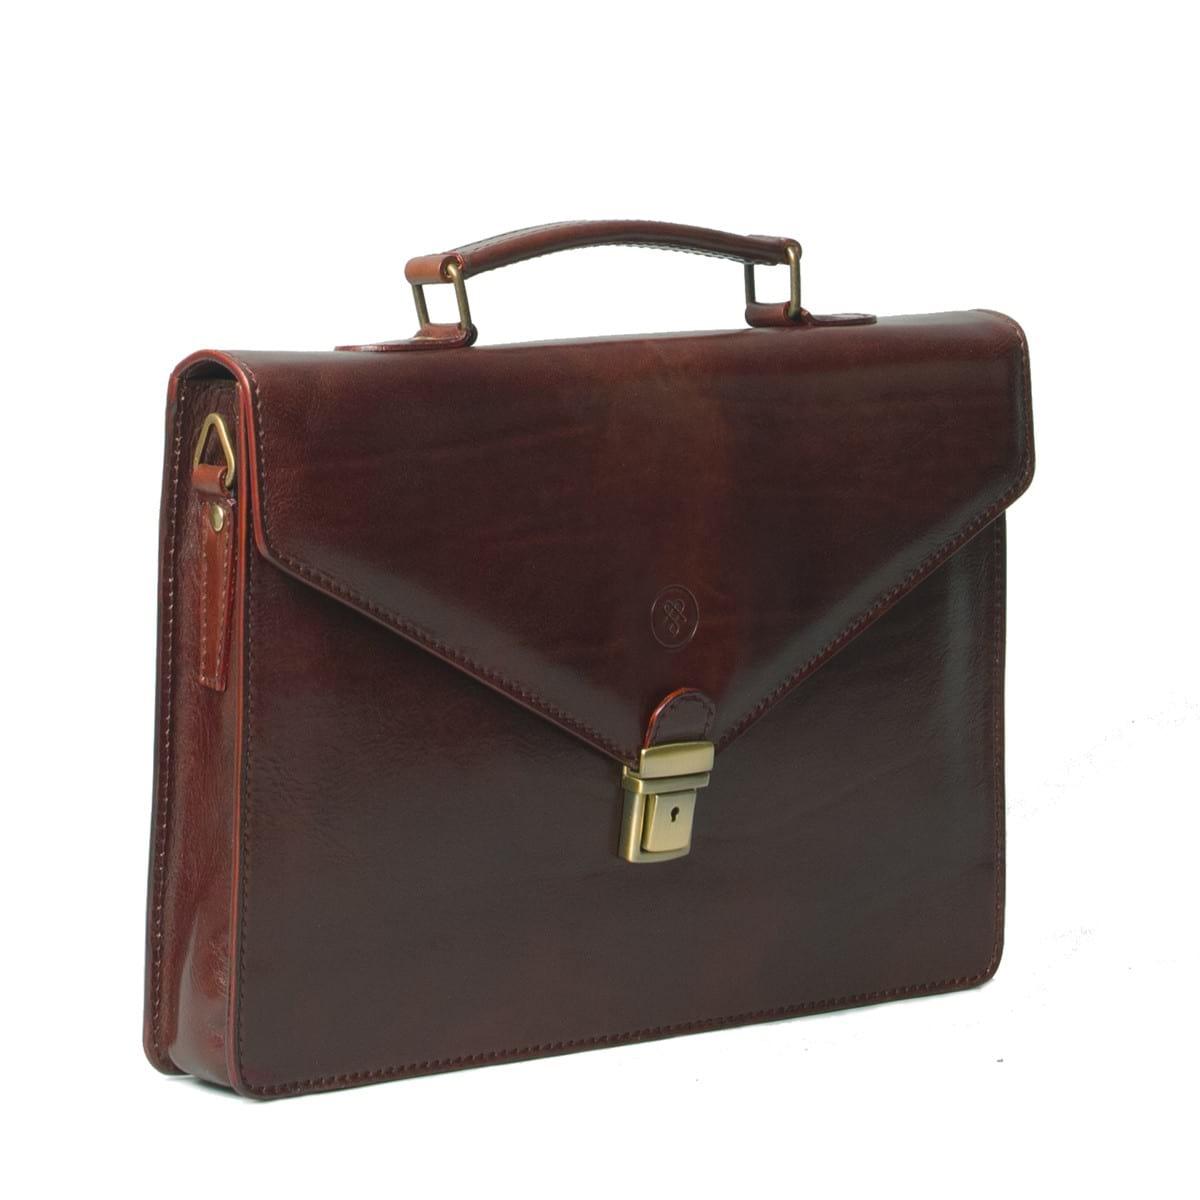 silver briefcase photo - 1